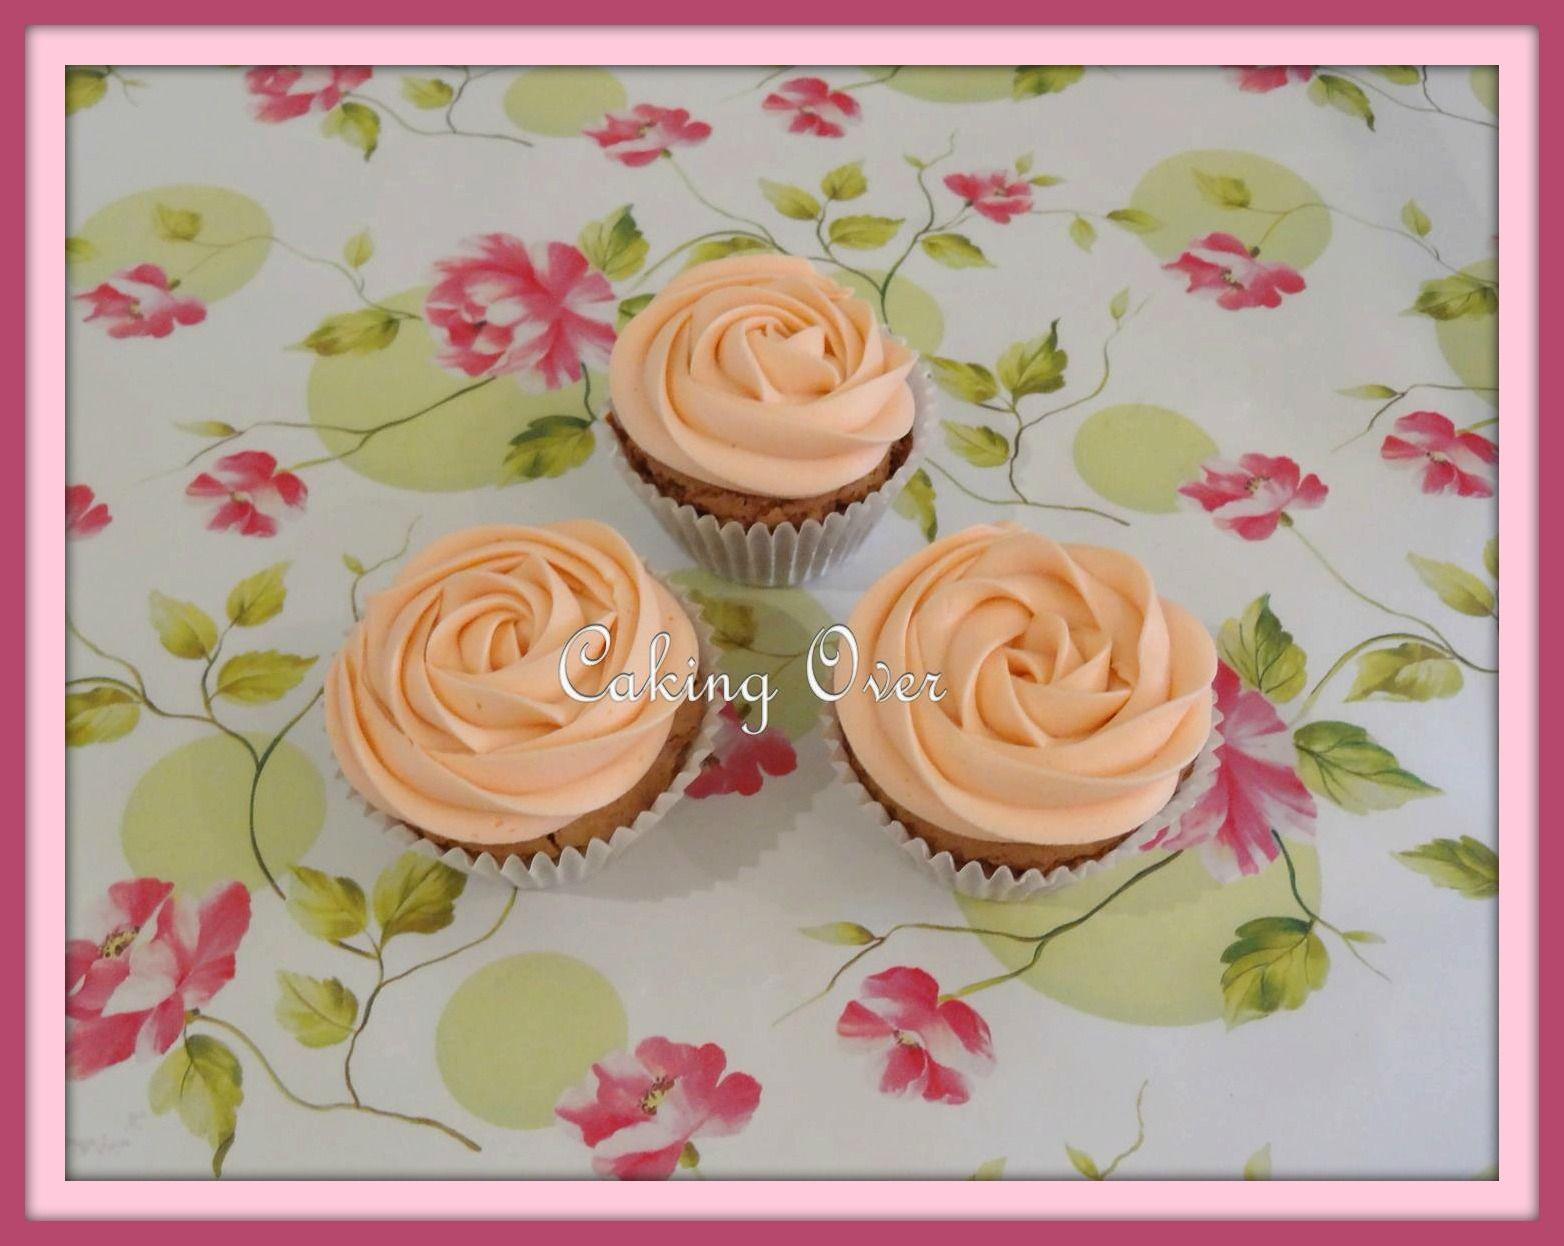 Gluten free chocolate cupcakes with white chocolate